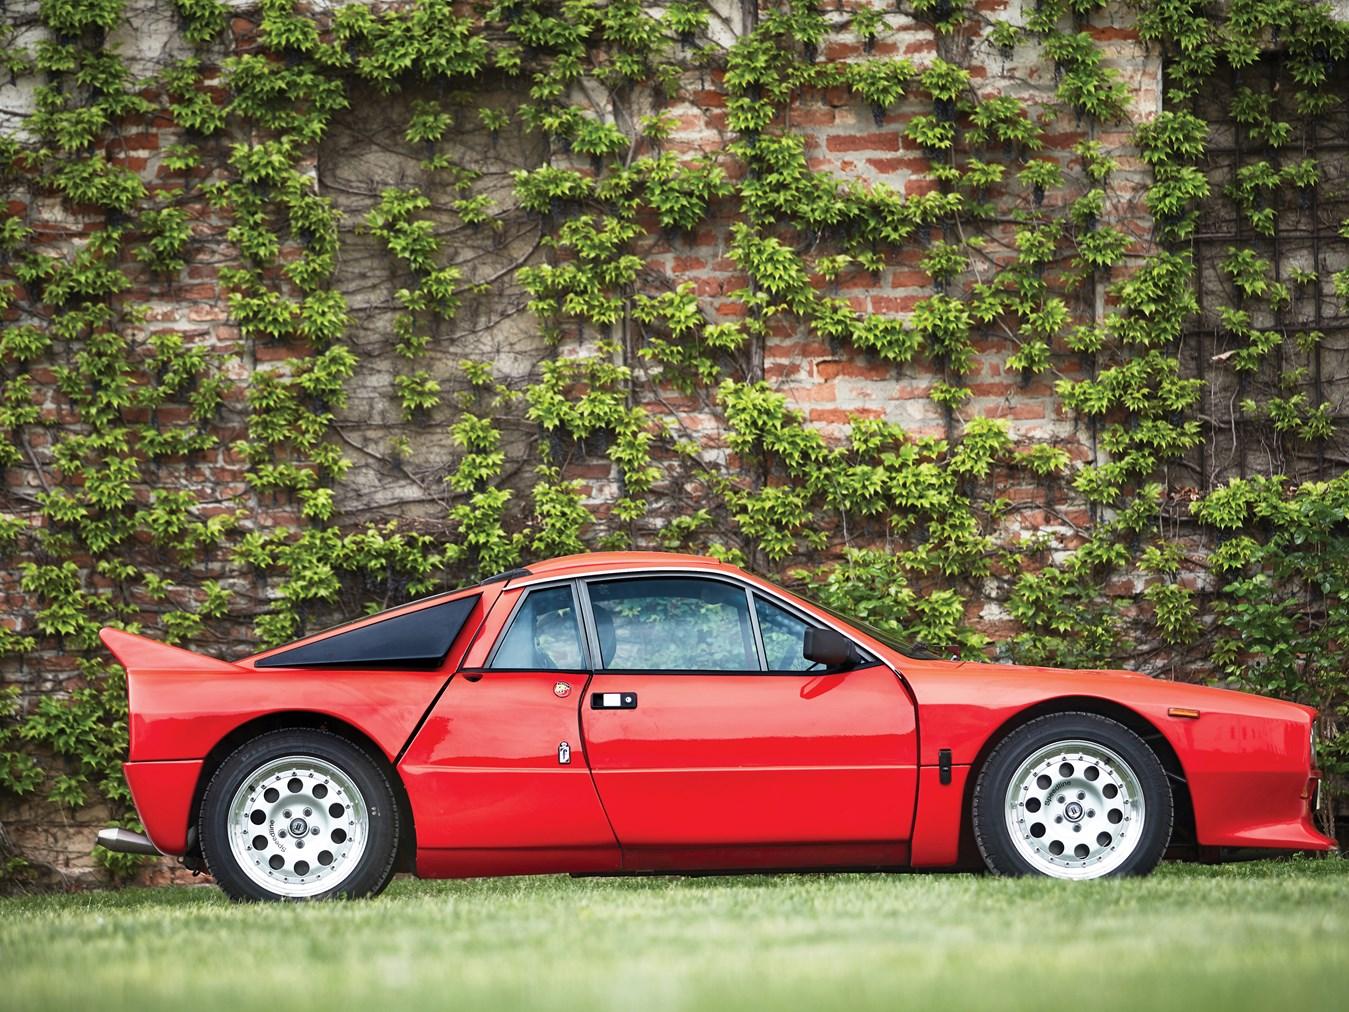 1982 Lancia Rally 037 Stradale